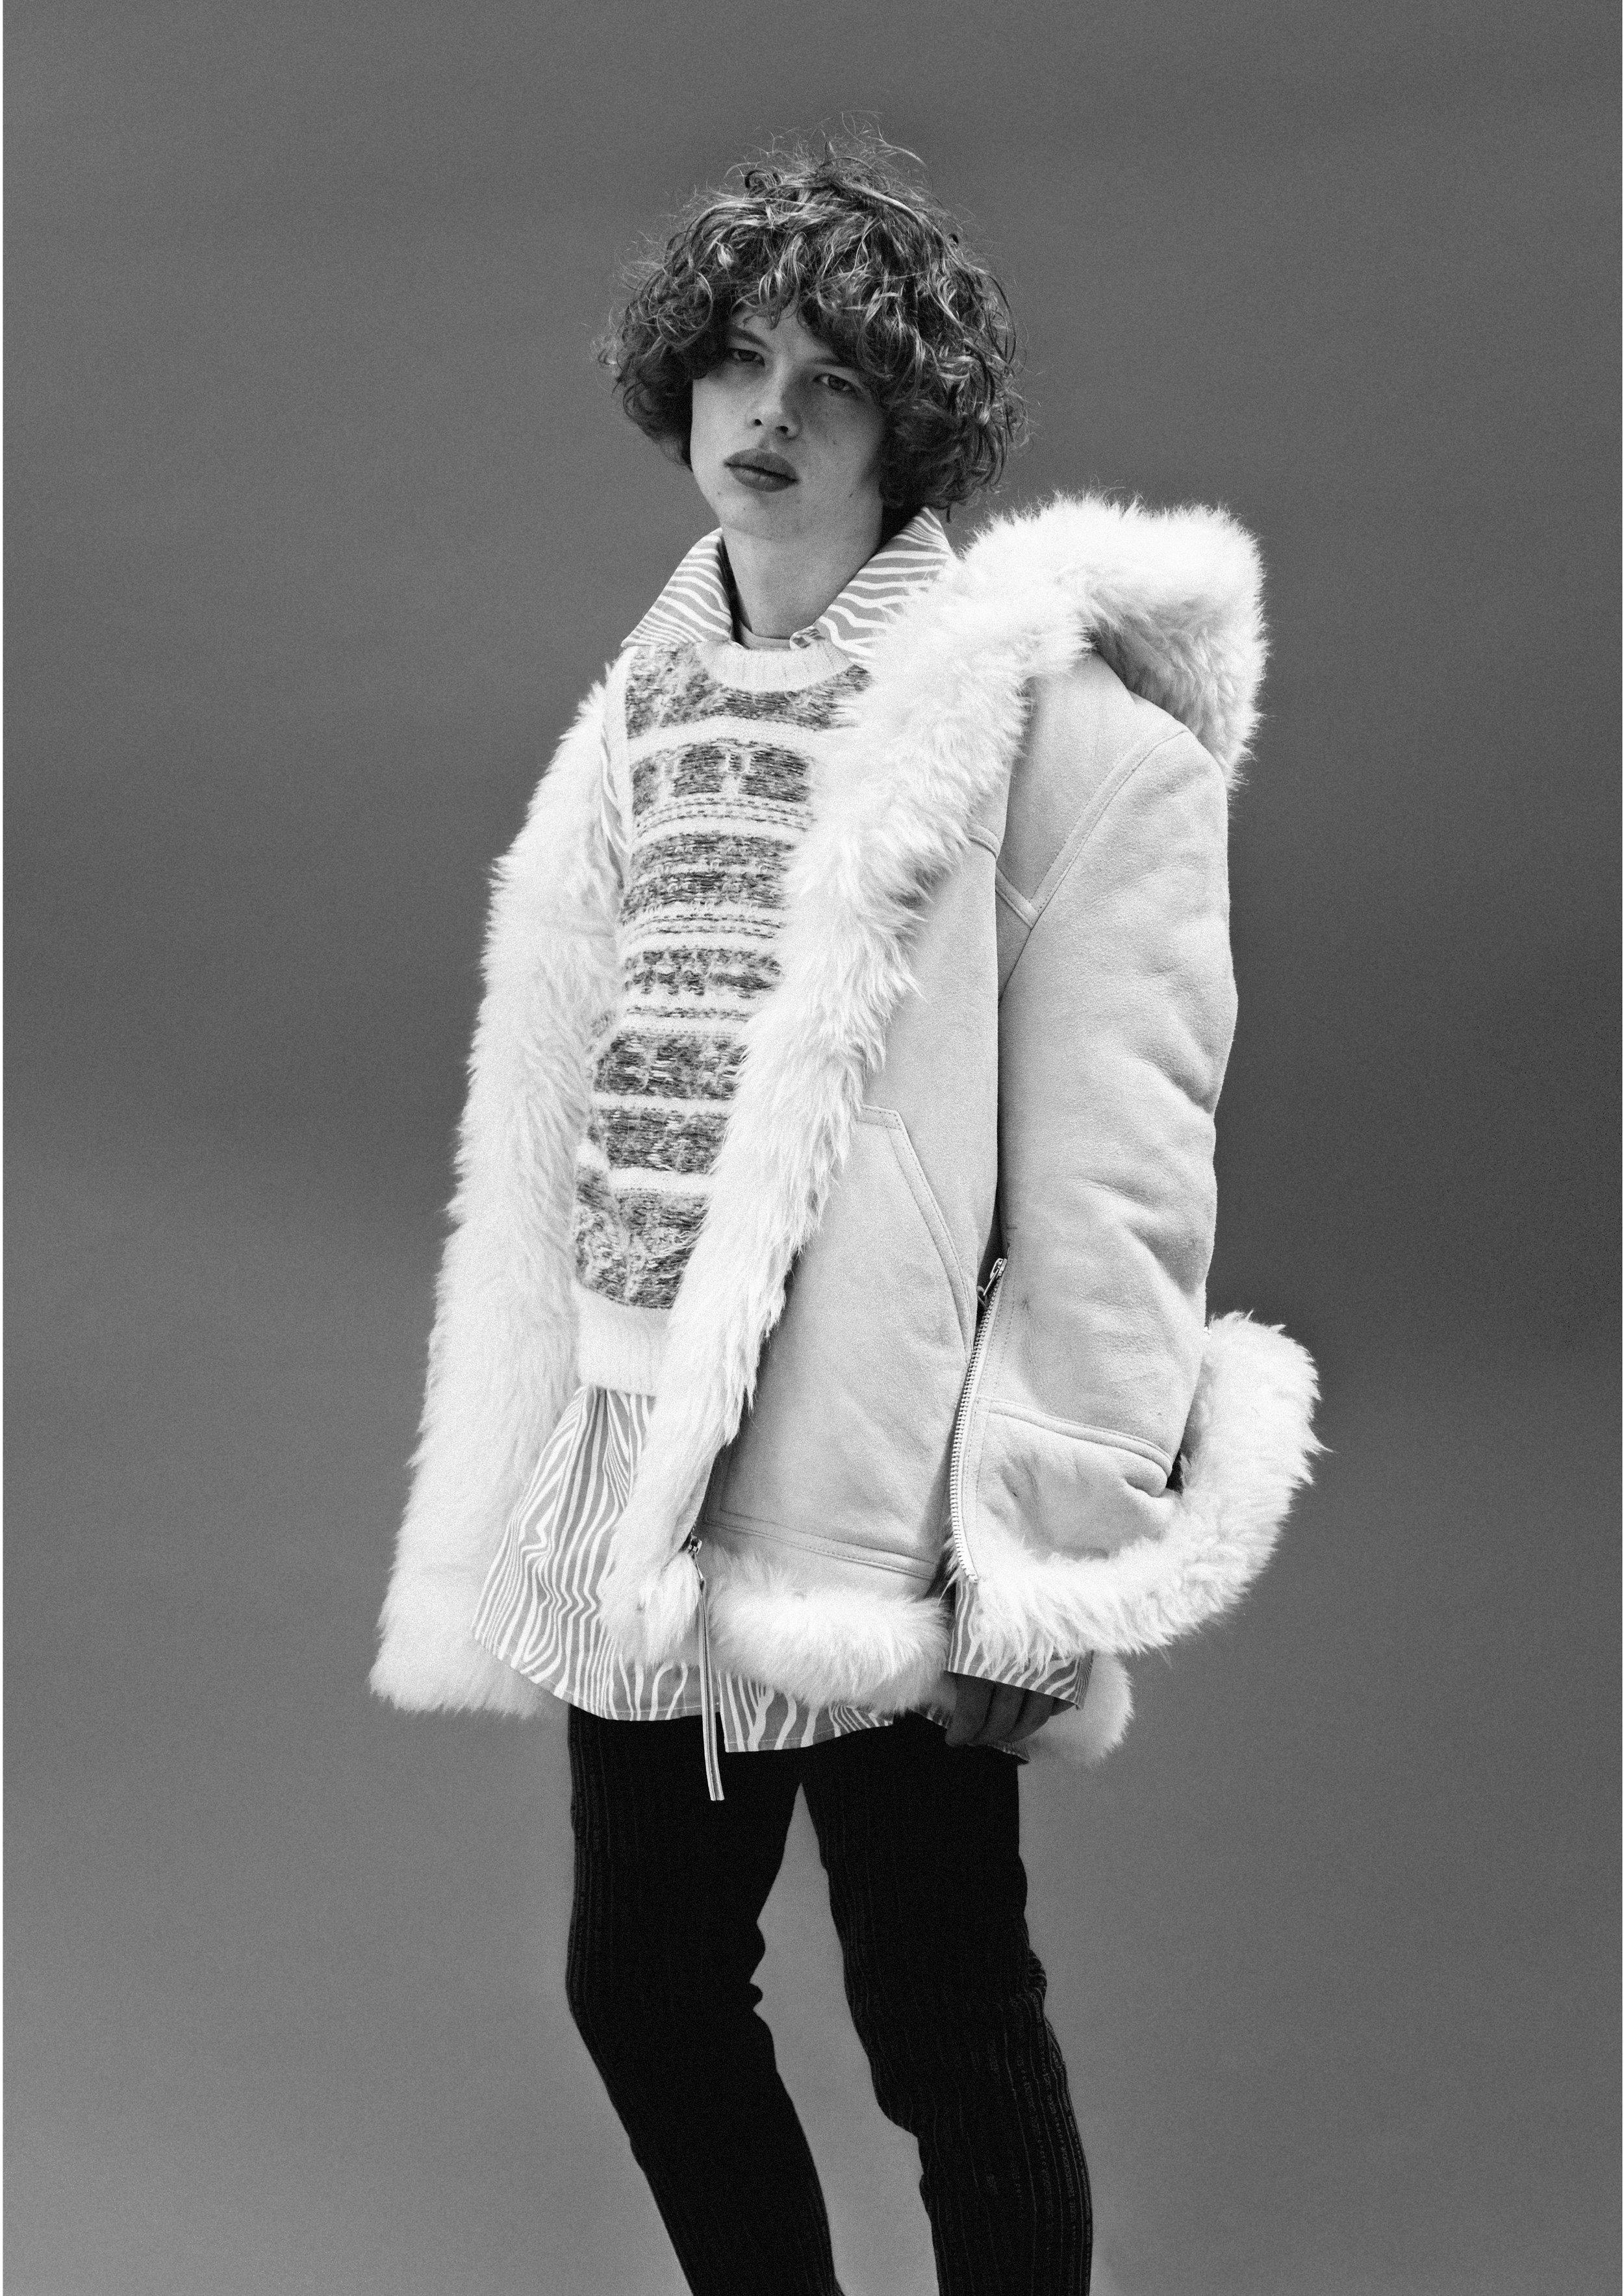 Shearling Jacket - Acne Studios Vest - Acne Studios Shirt - Alex Mullins Trousers - Wooyoungmi